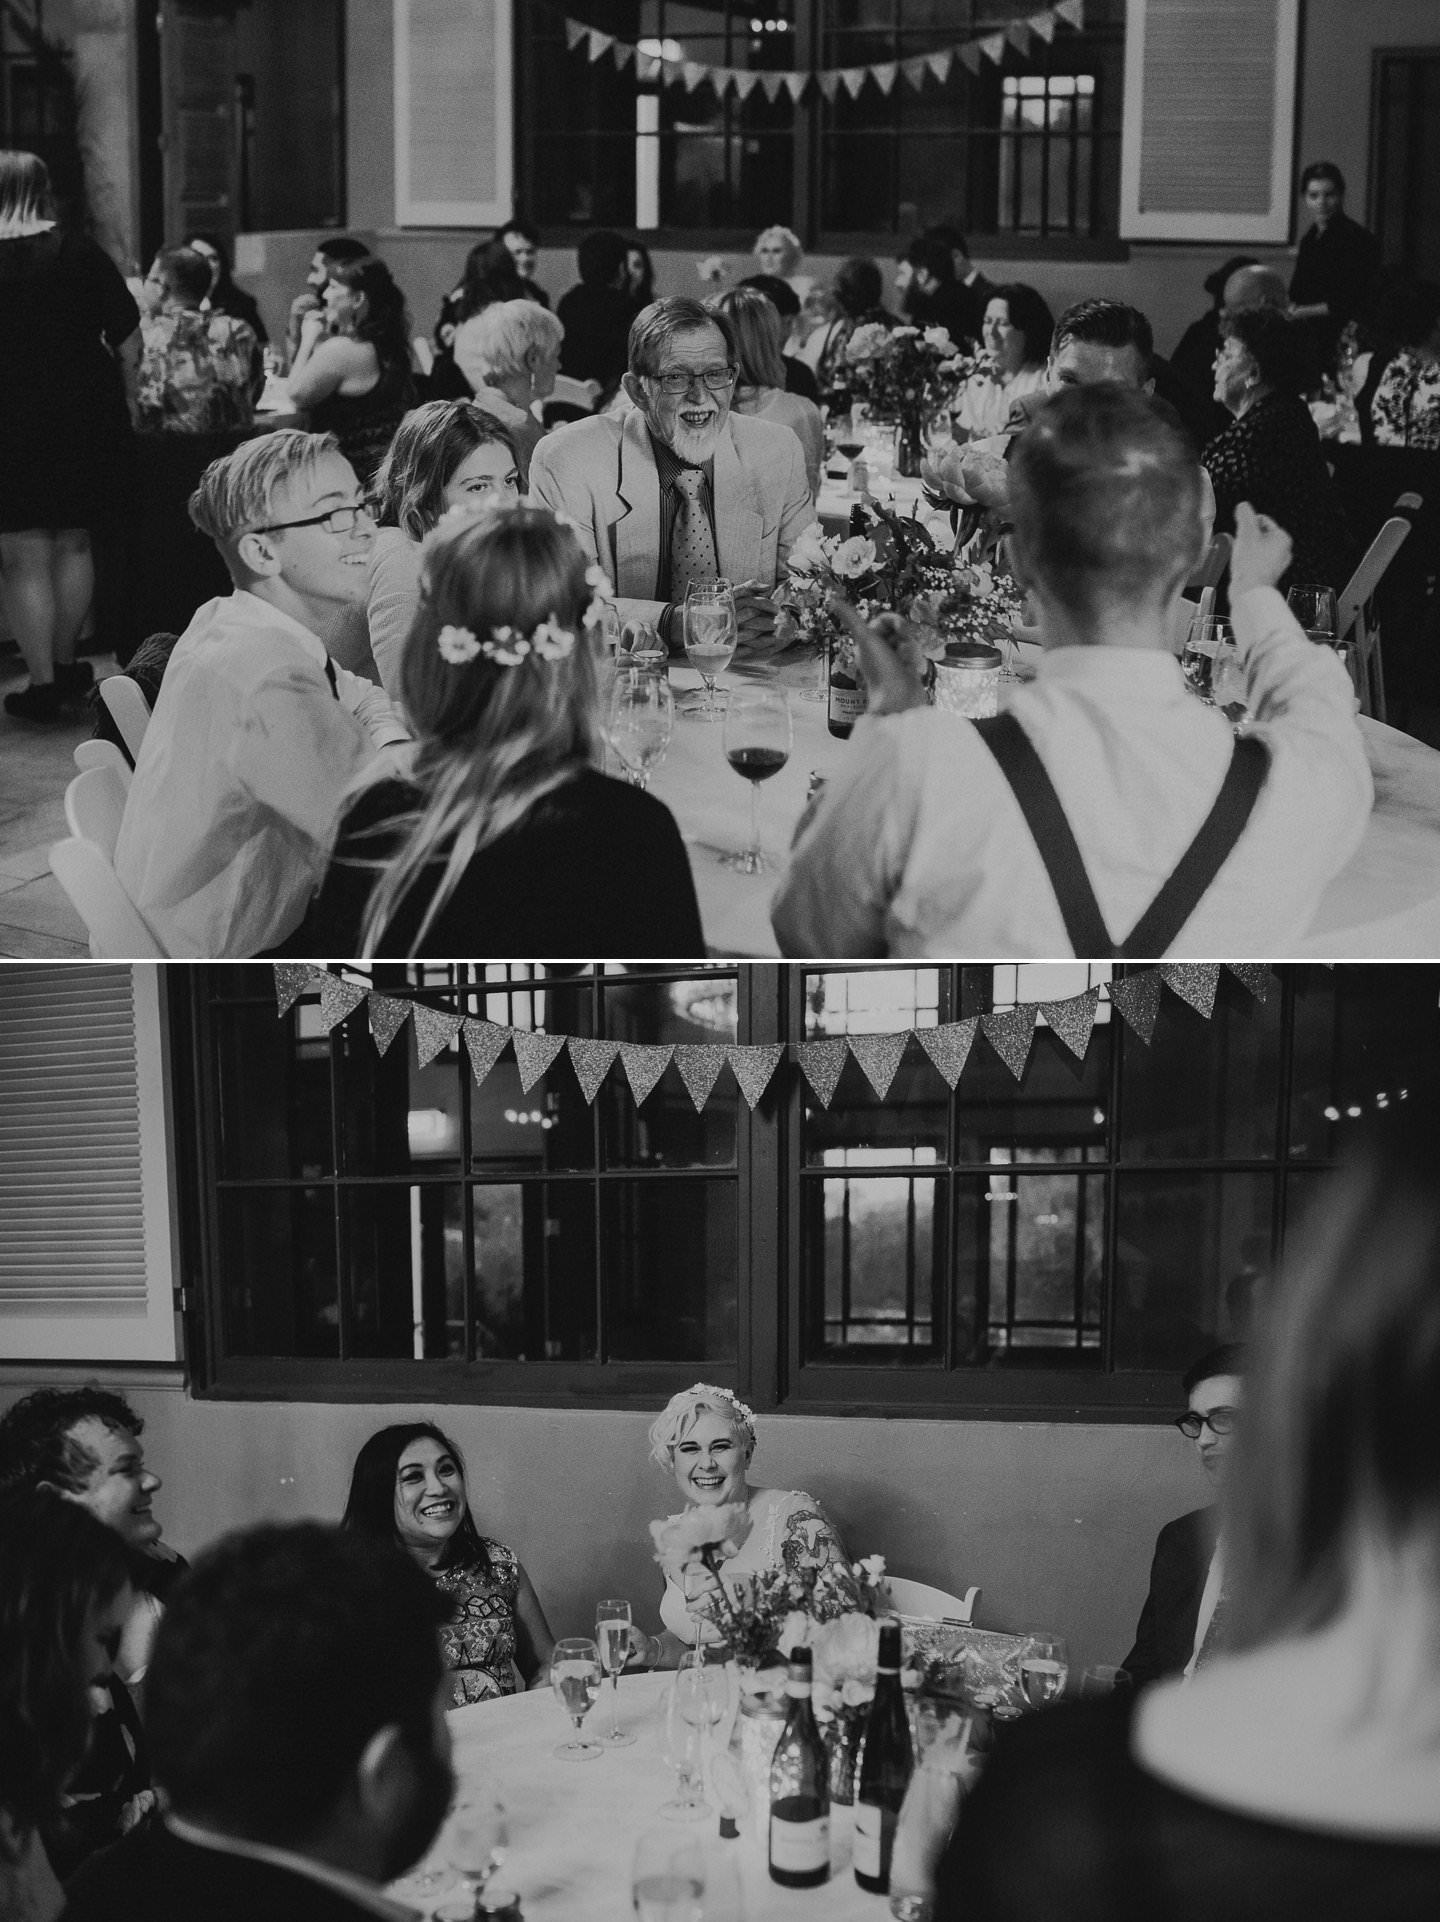 Candid wedding photos of wedding guests having fun